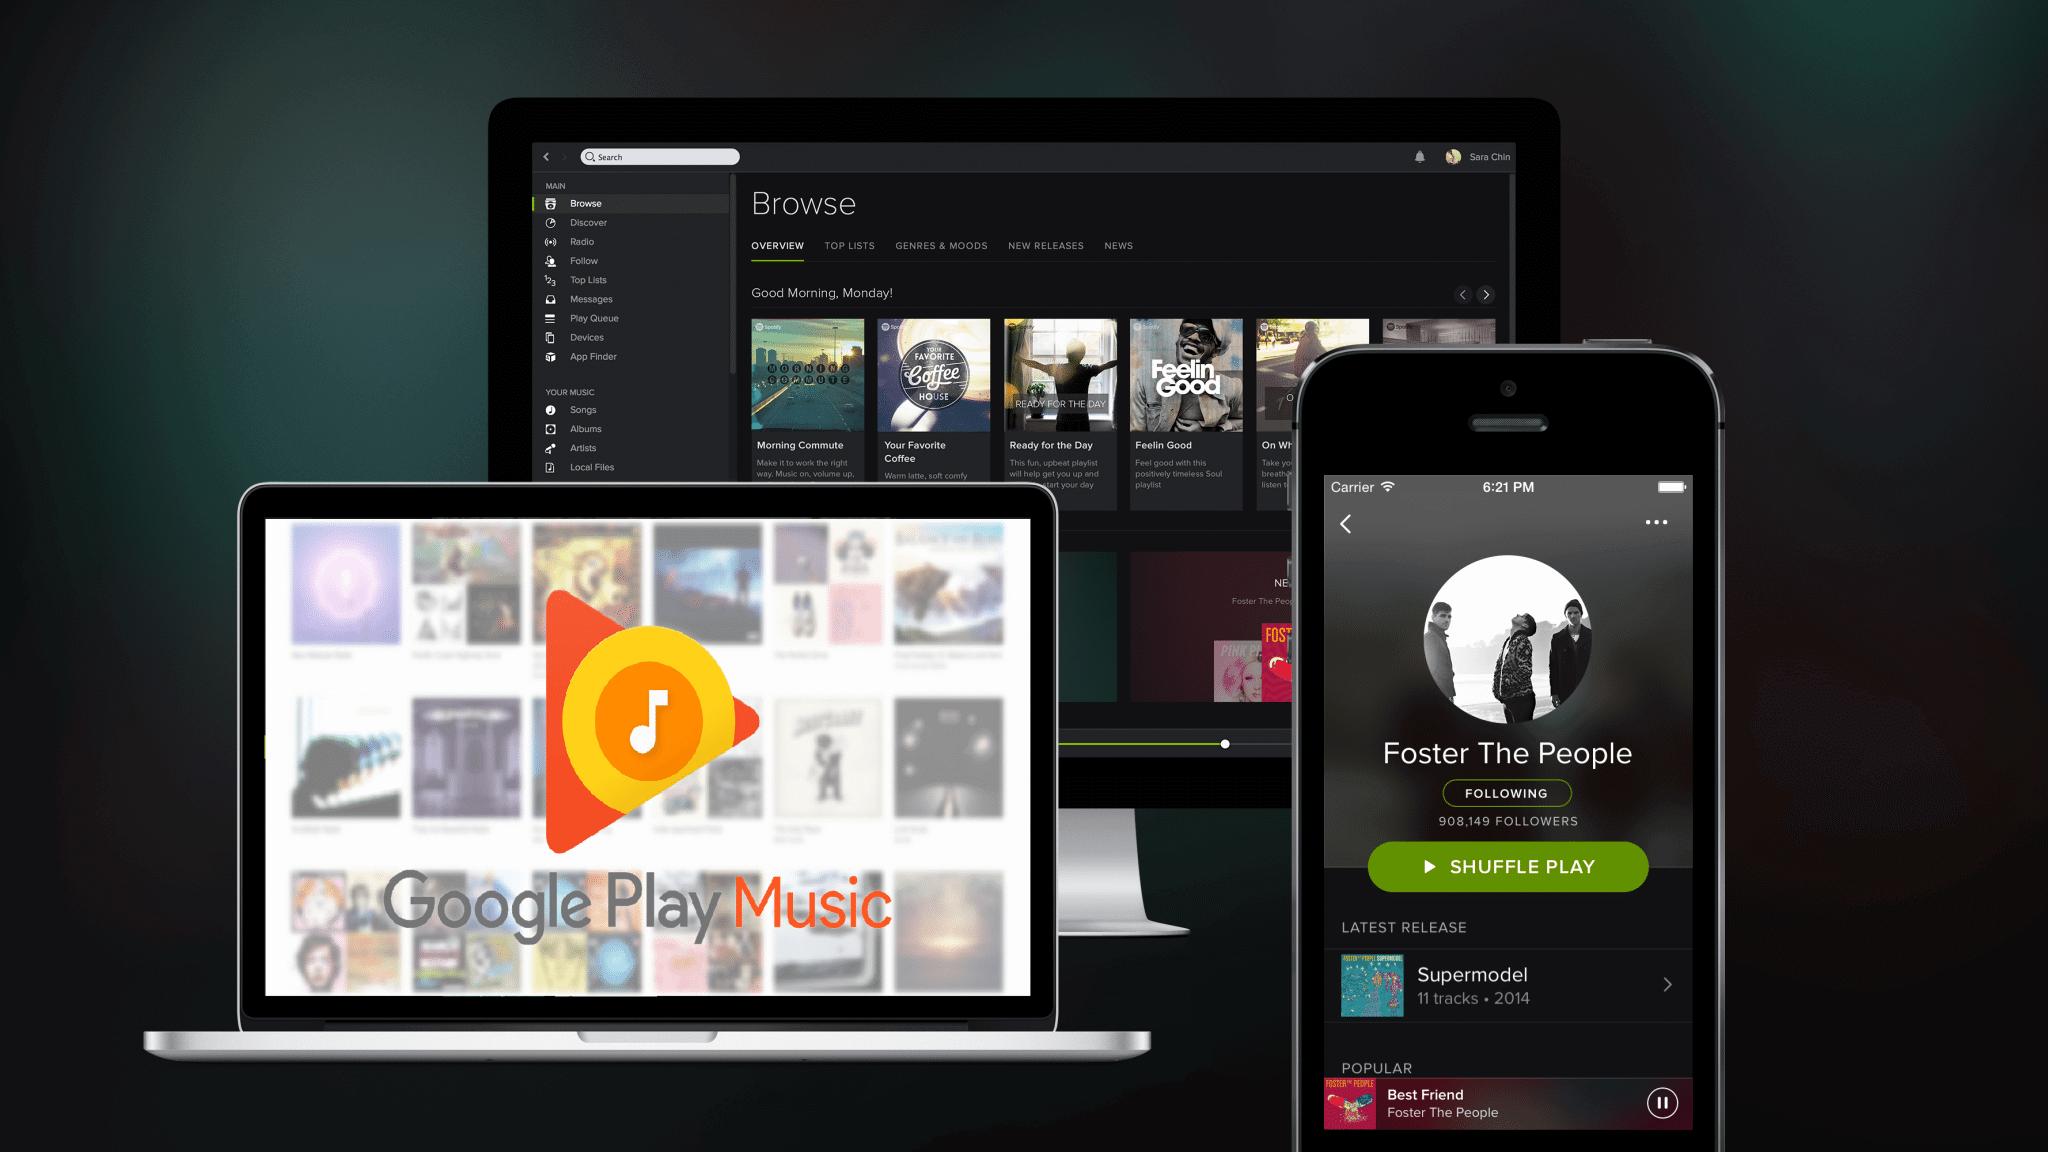 spotify Google music apps